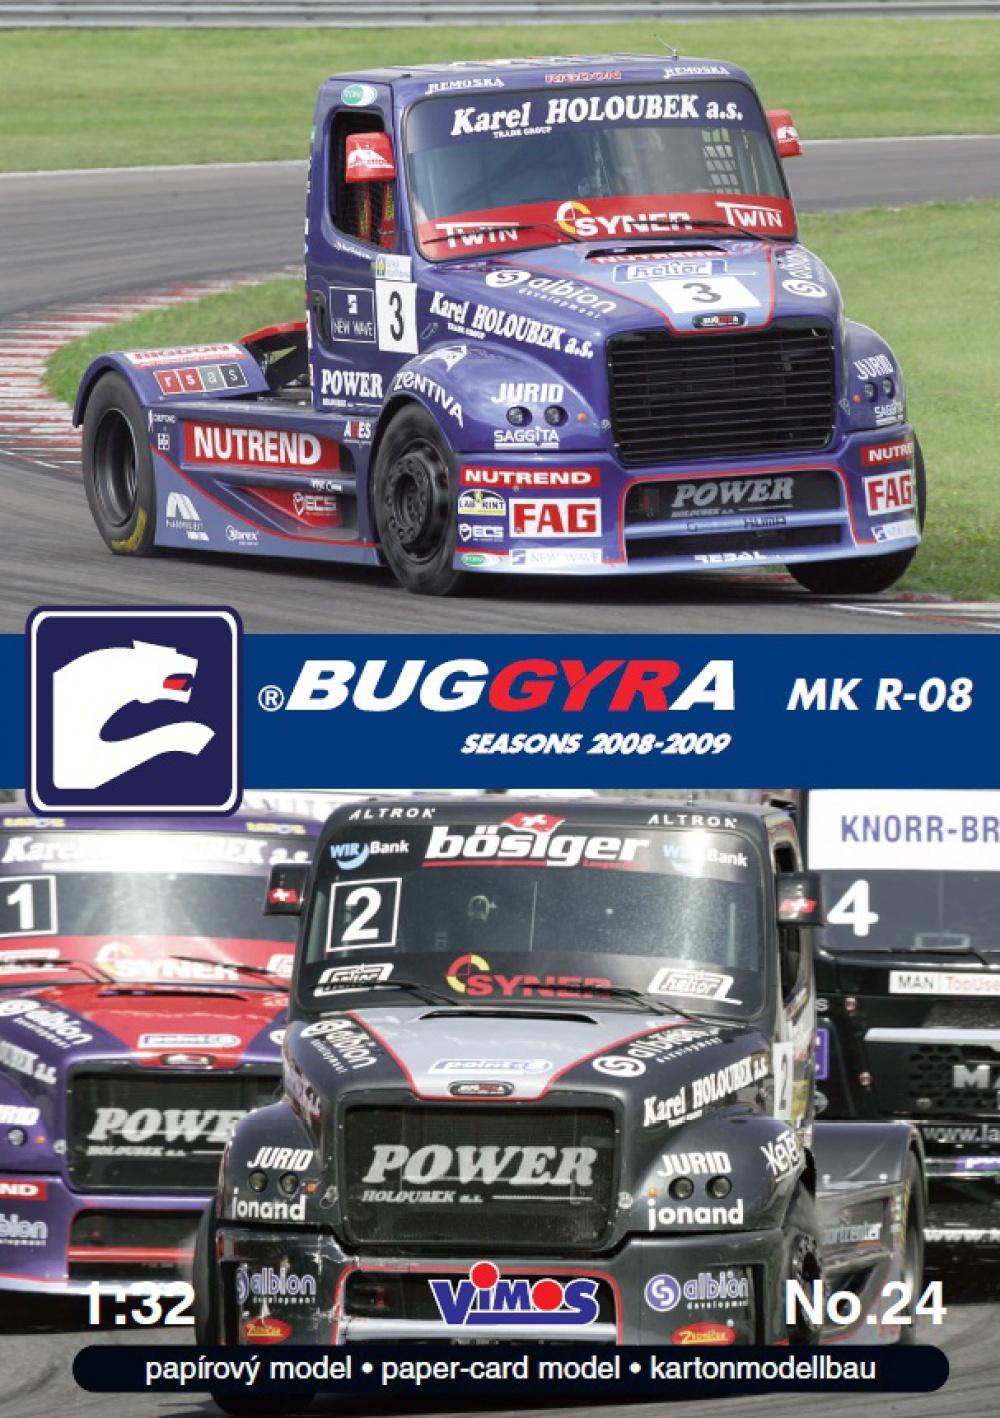 Buggyra MK-R 08